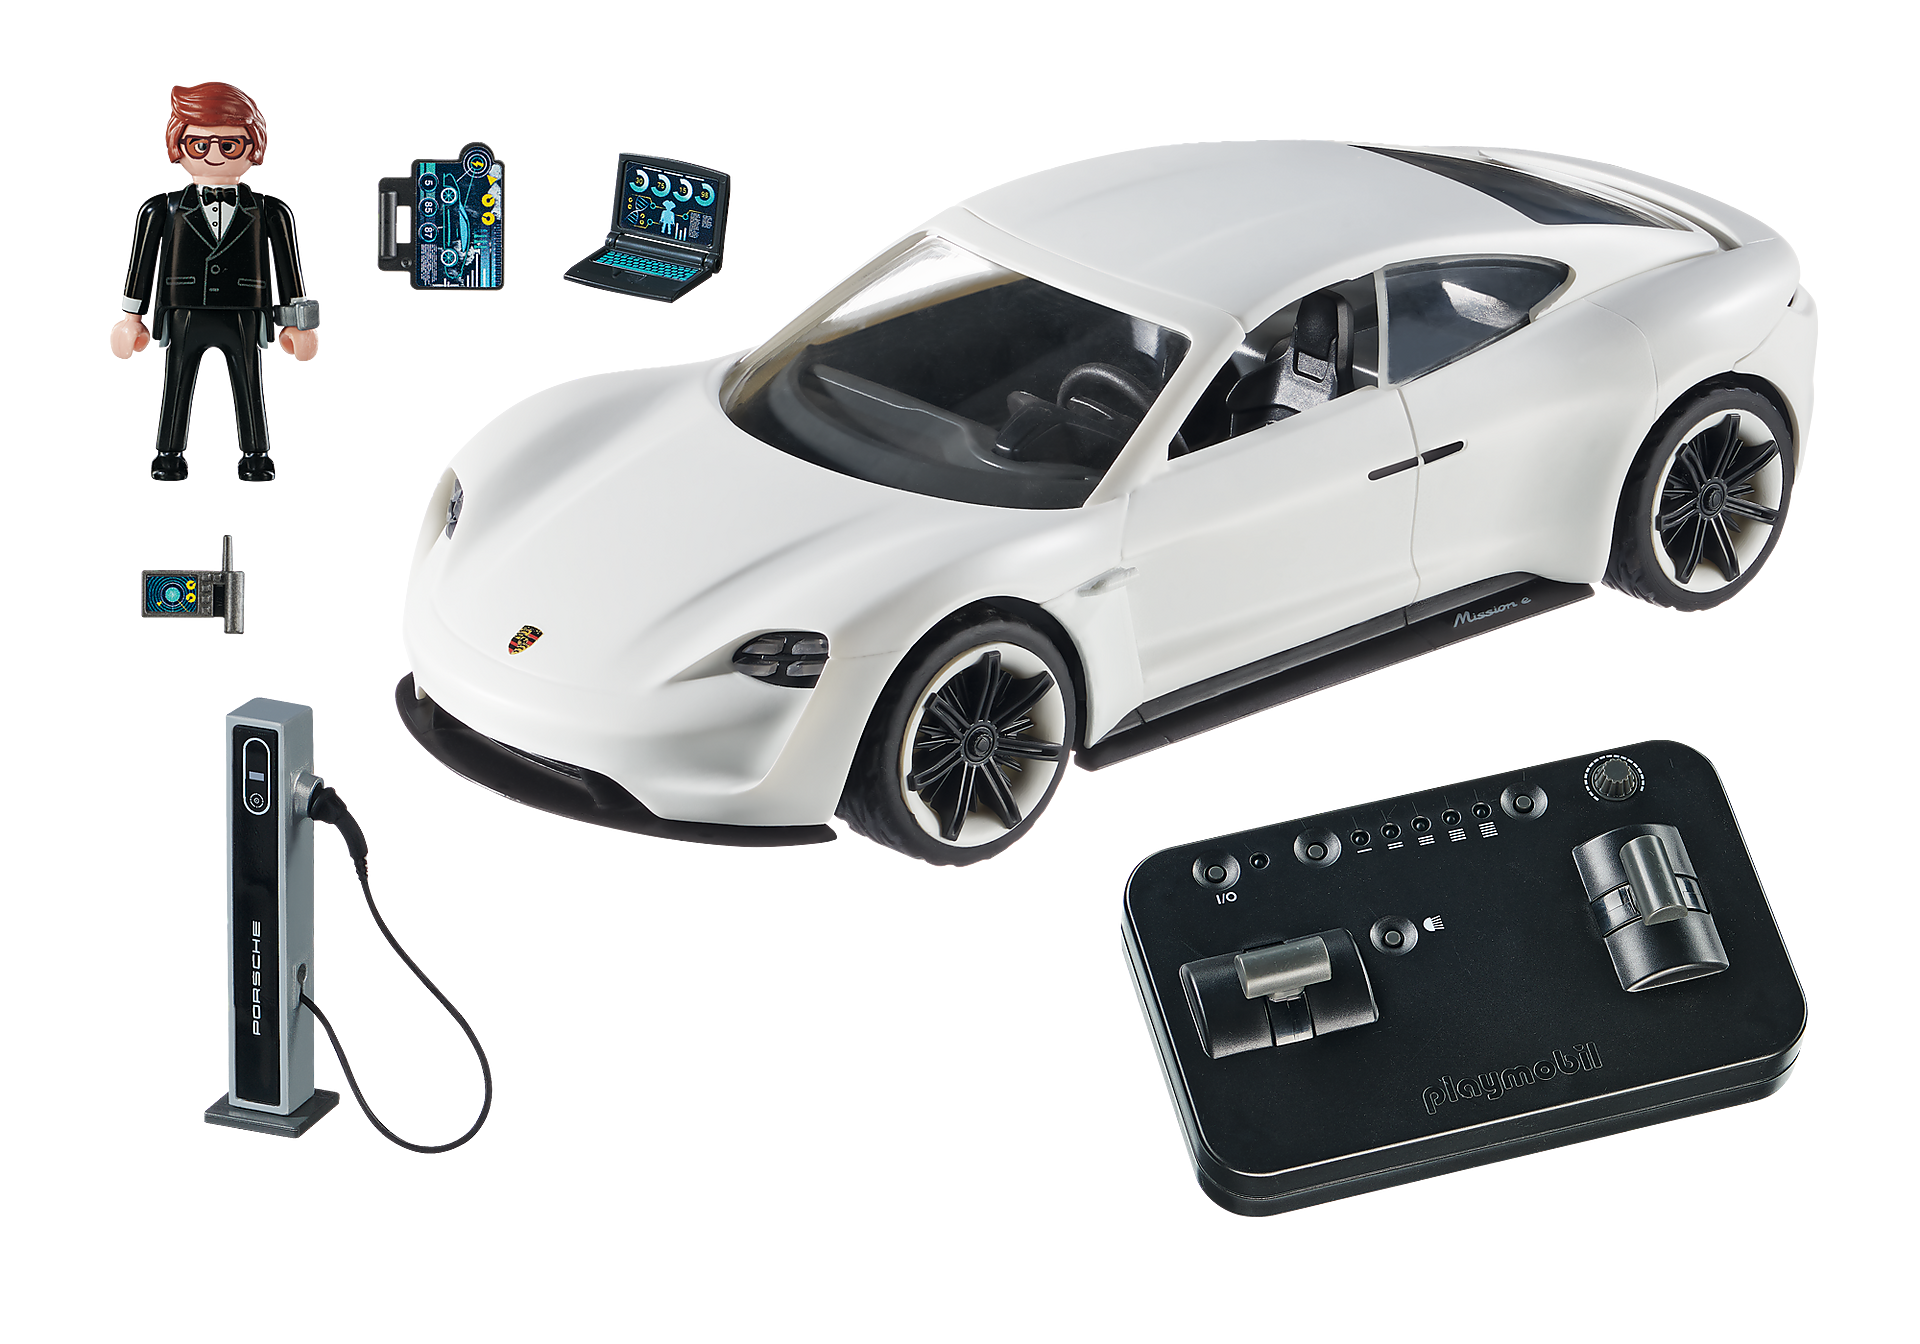 70078 PLAYMOBIL: THE MOVIE Rex Dasher et  Porsche Mission E zoom image3